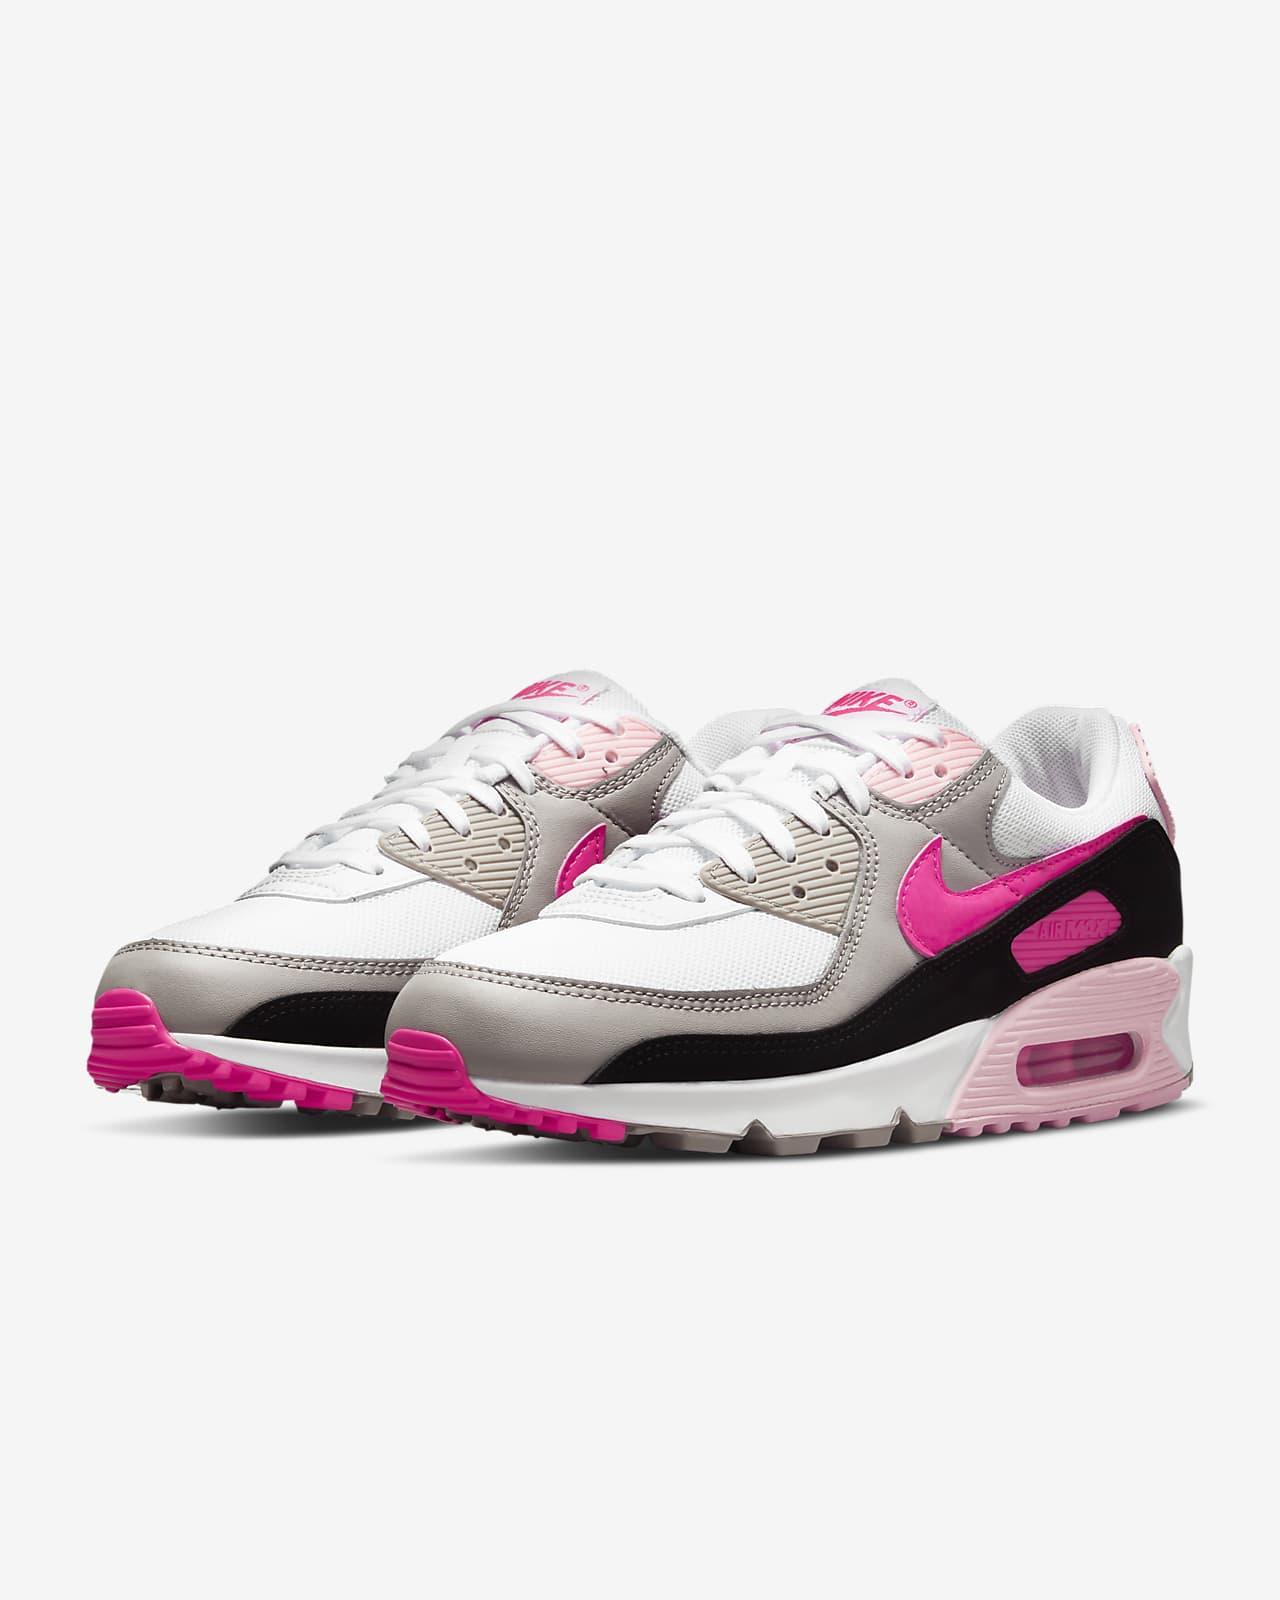 Nike Air Max 90 Women's Shoe. Nike DK